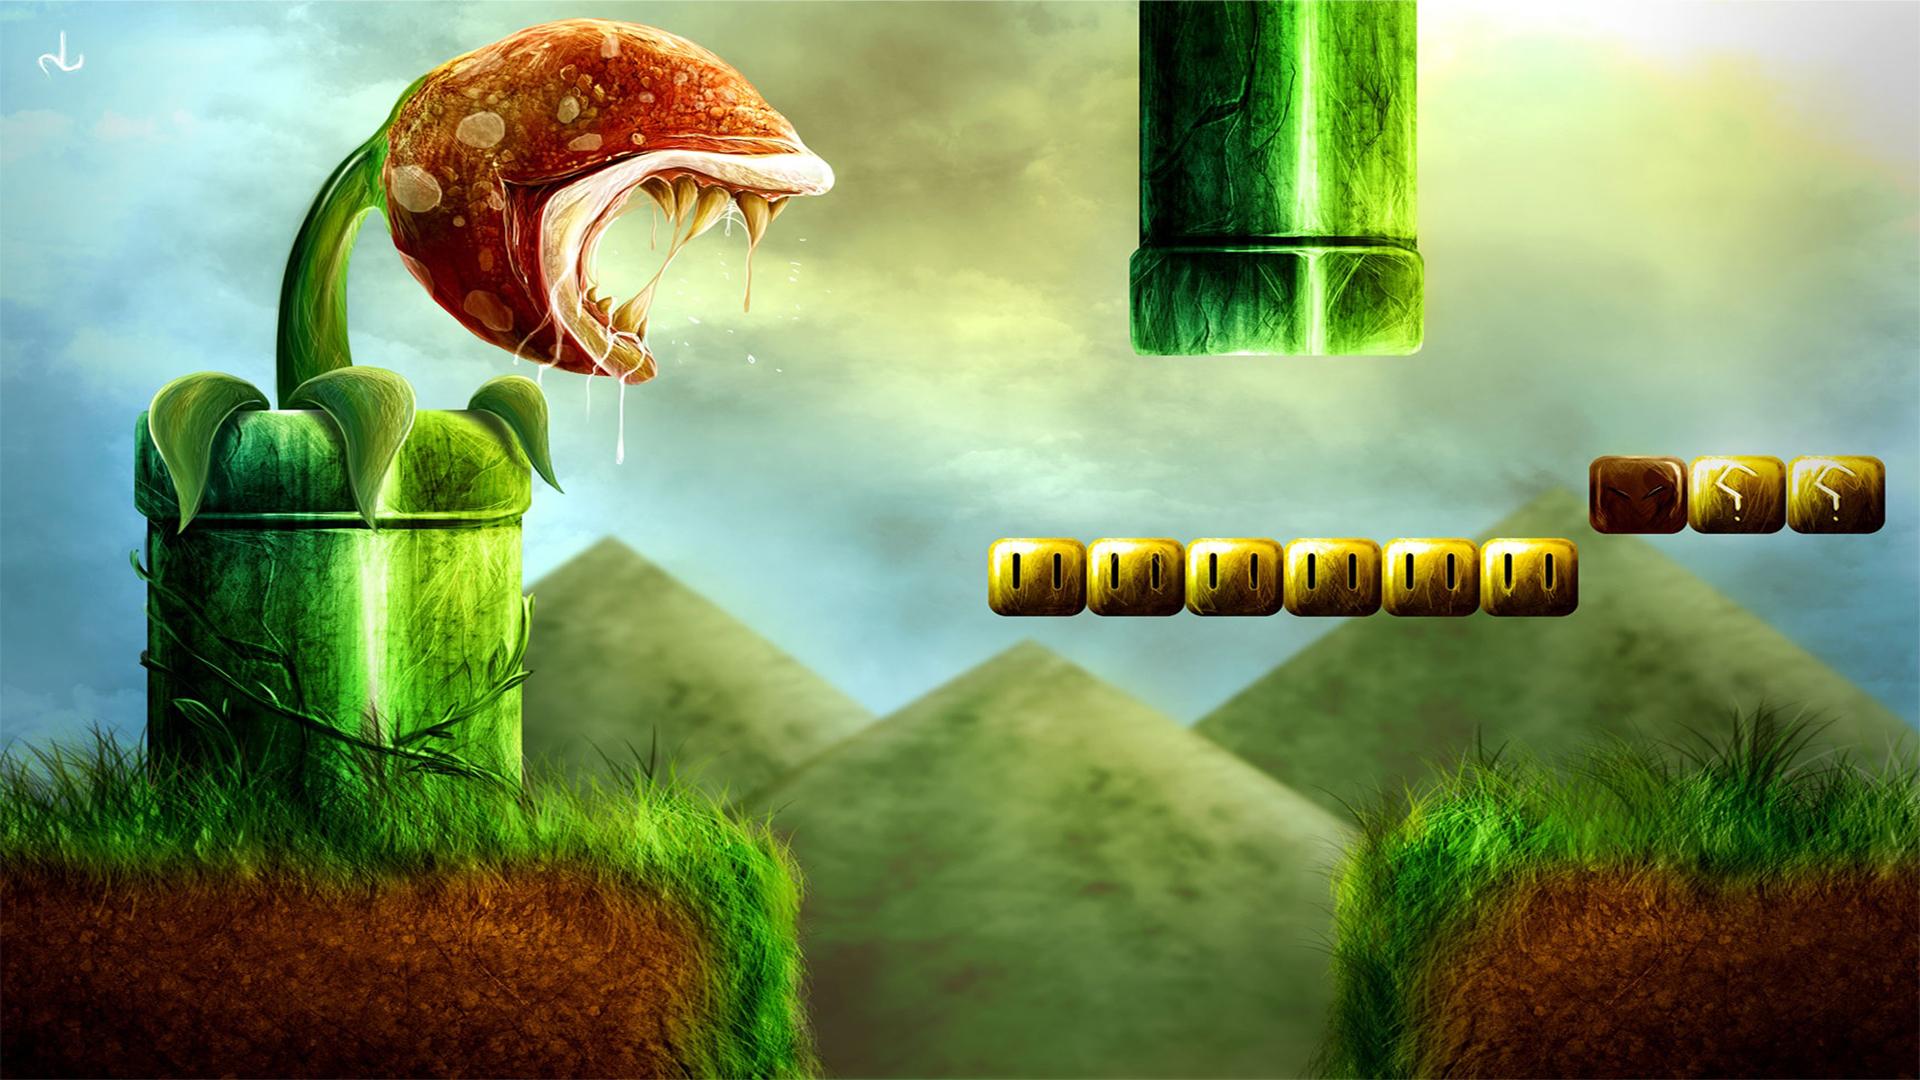 Video Game Desktop Backgrounds